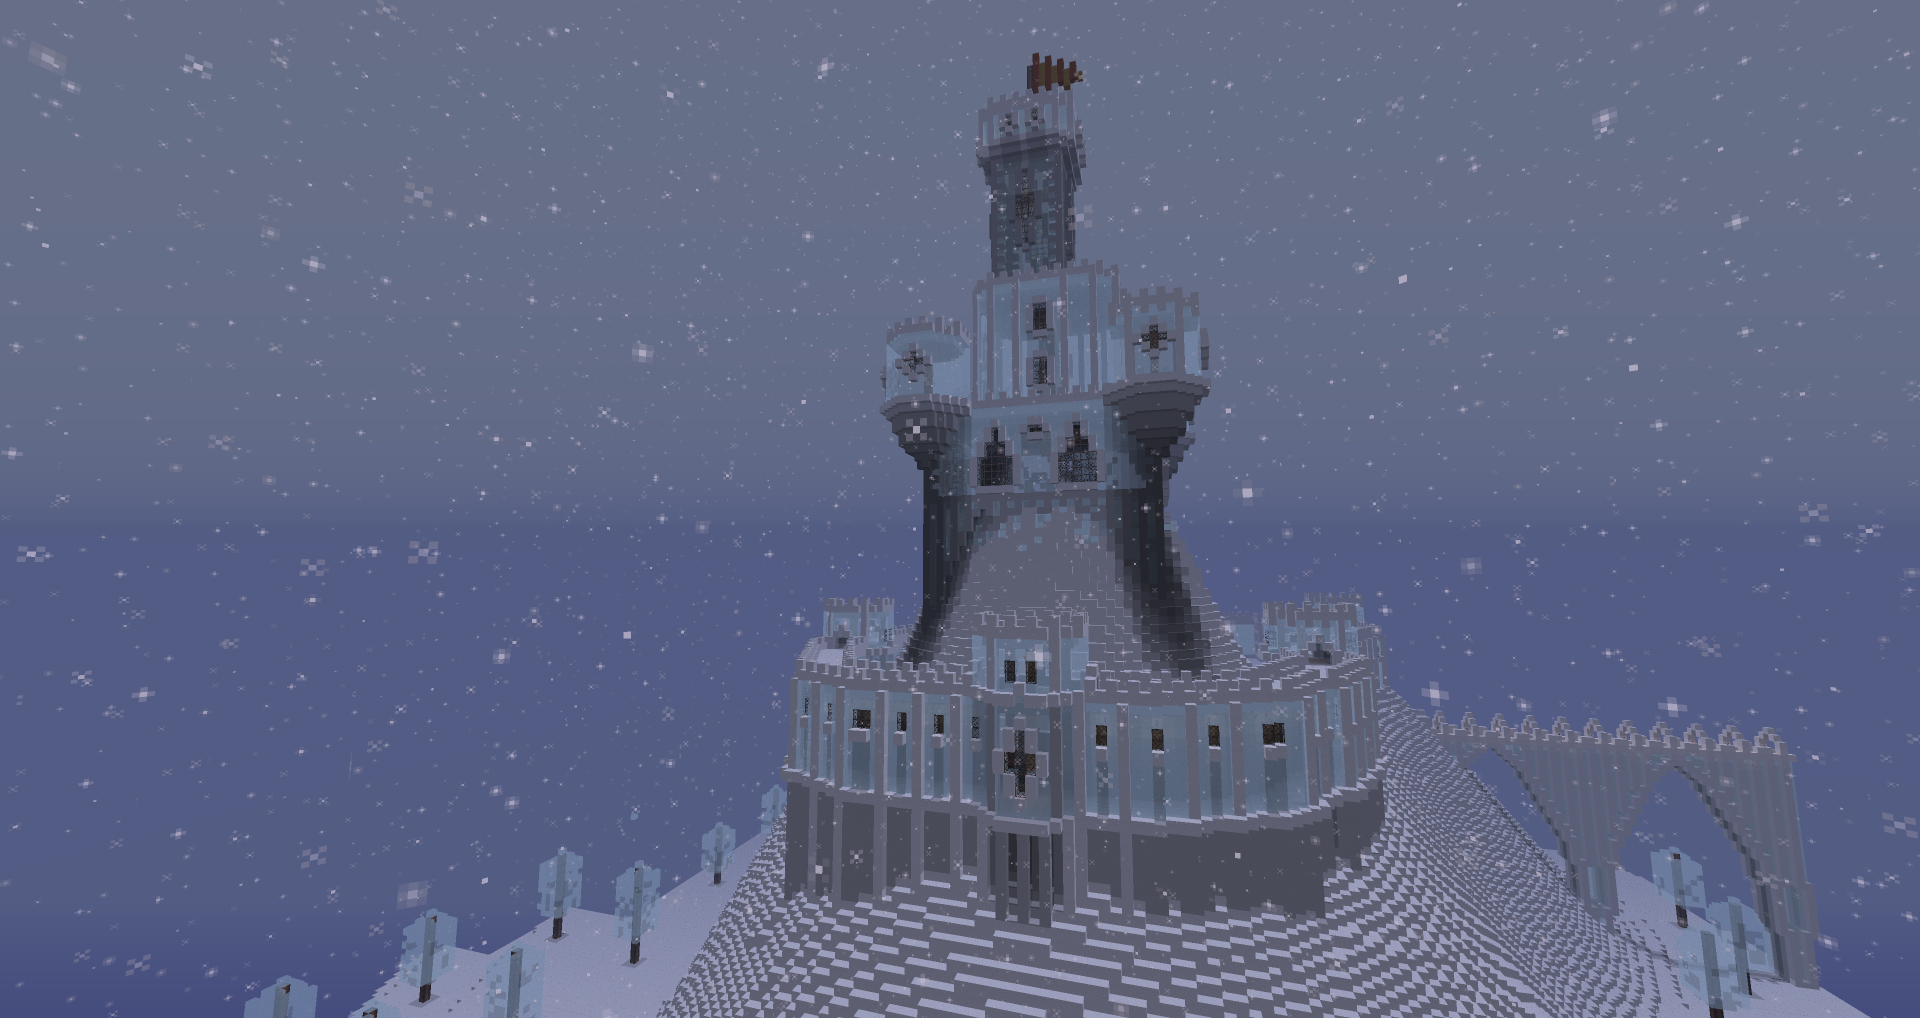 Theme from ice castles lyrics